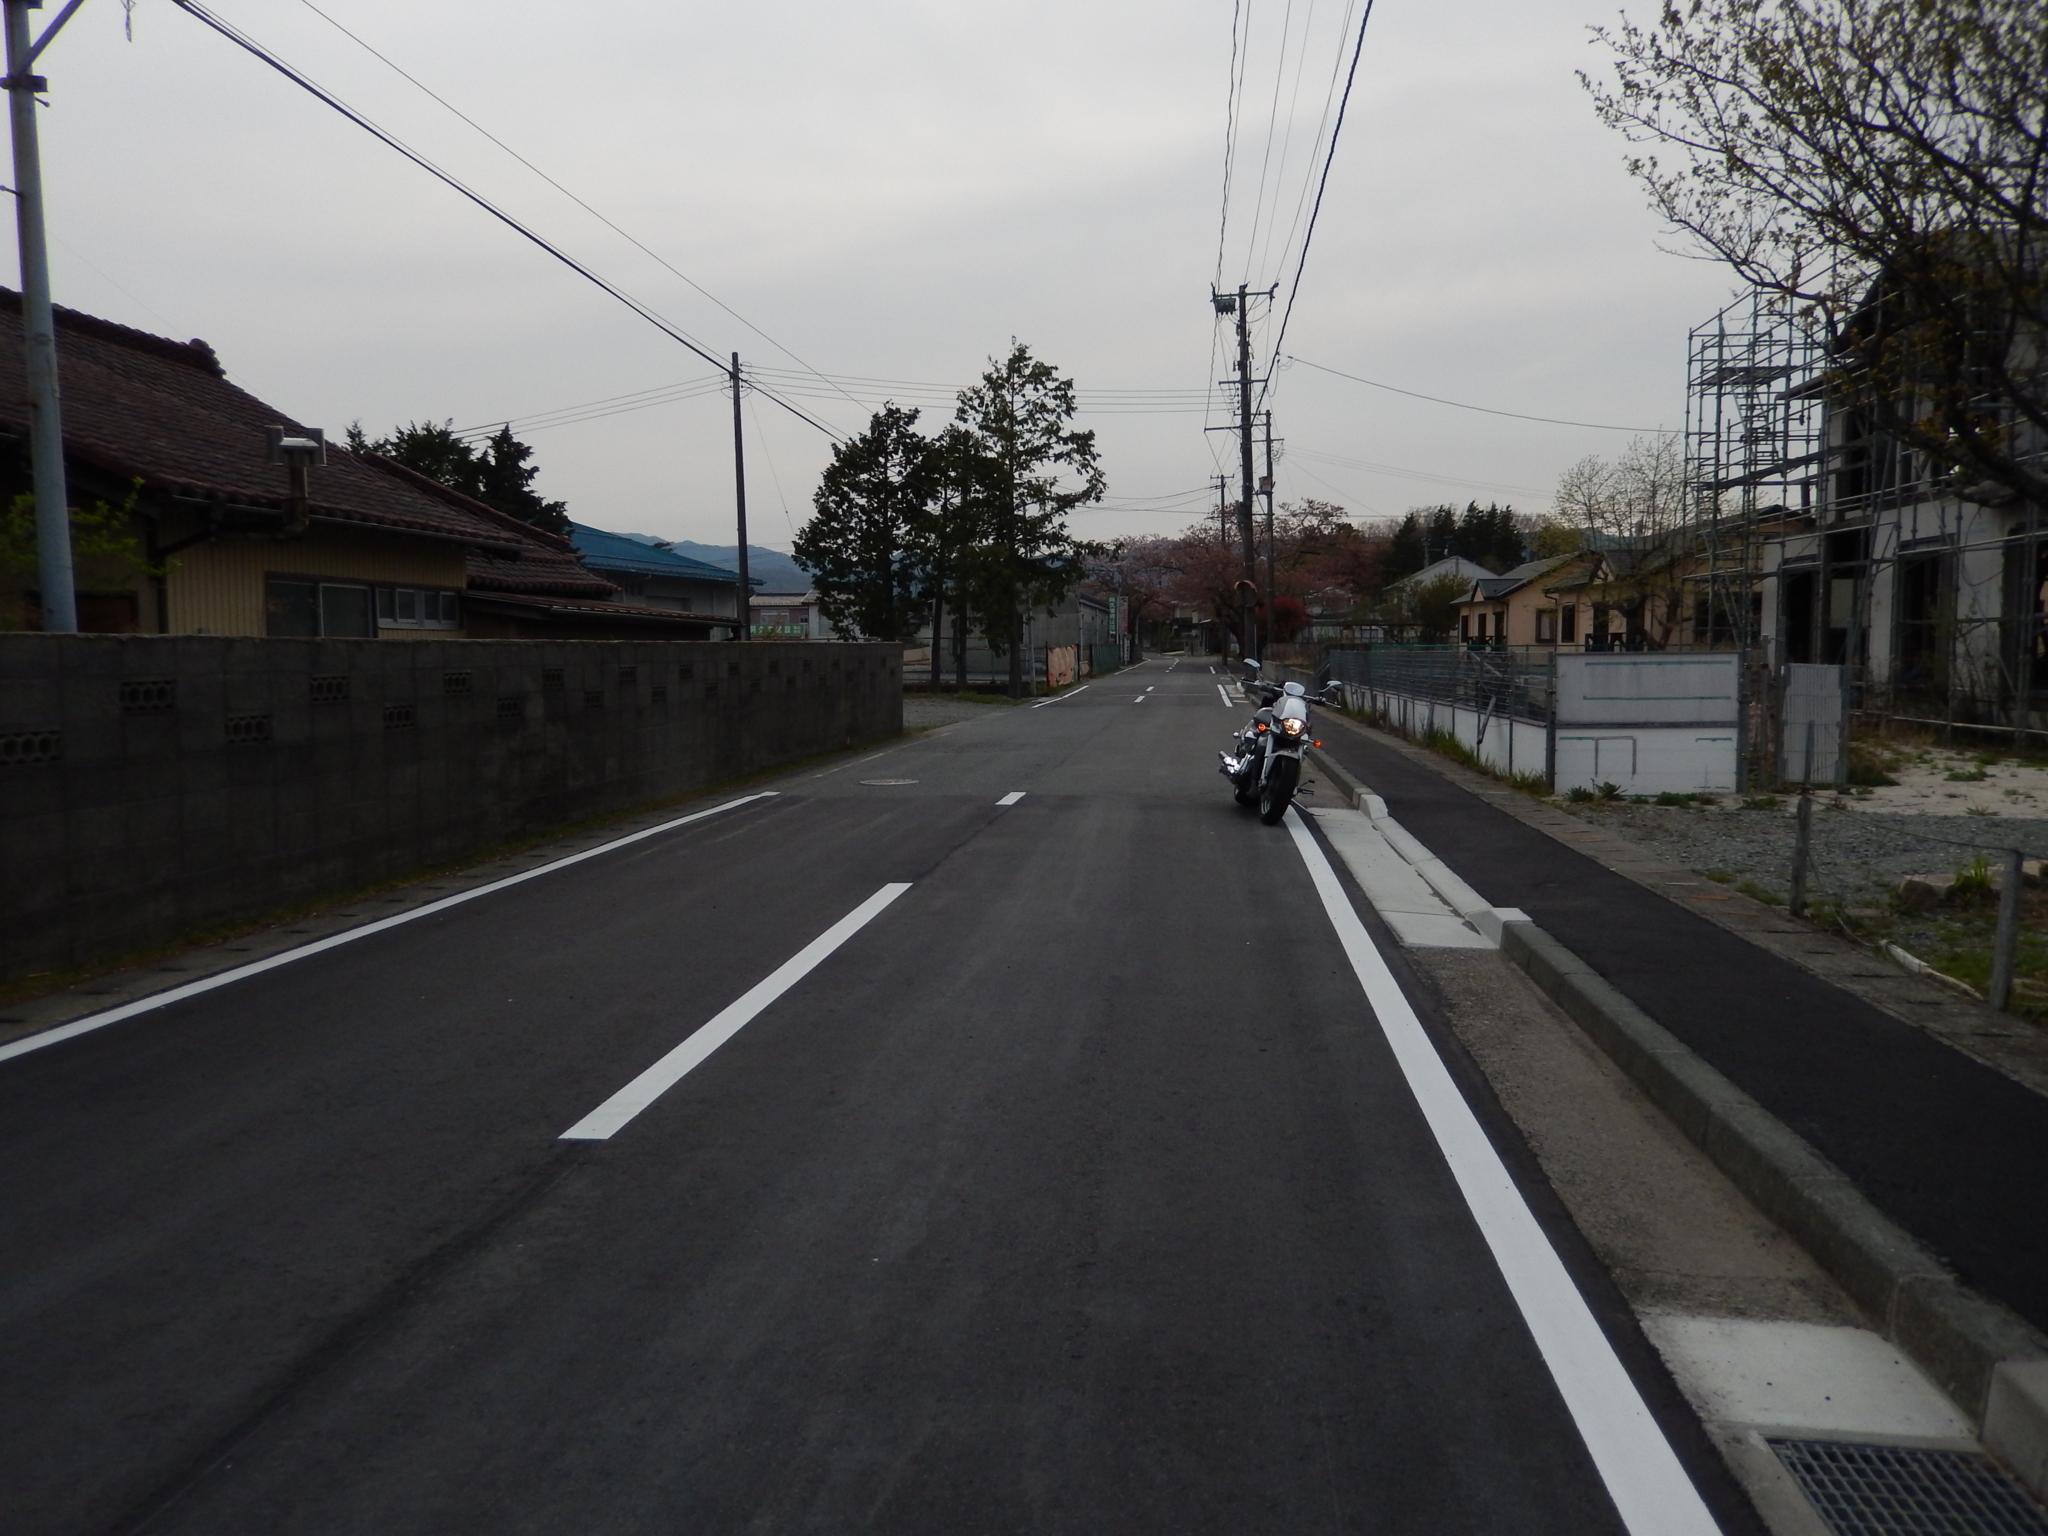 f:id:ToshUeno:20160416152157j:plain